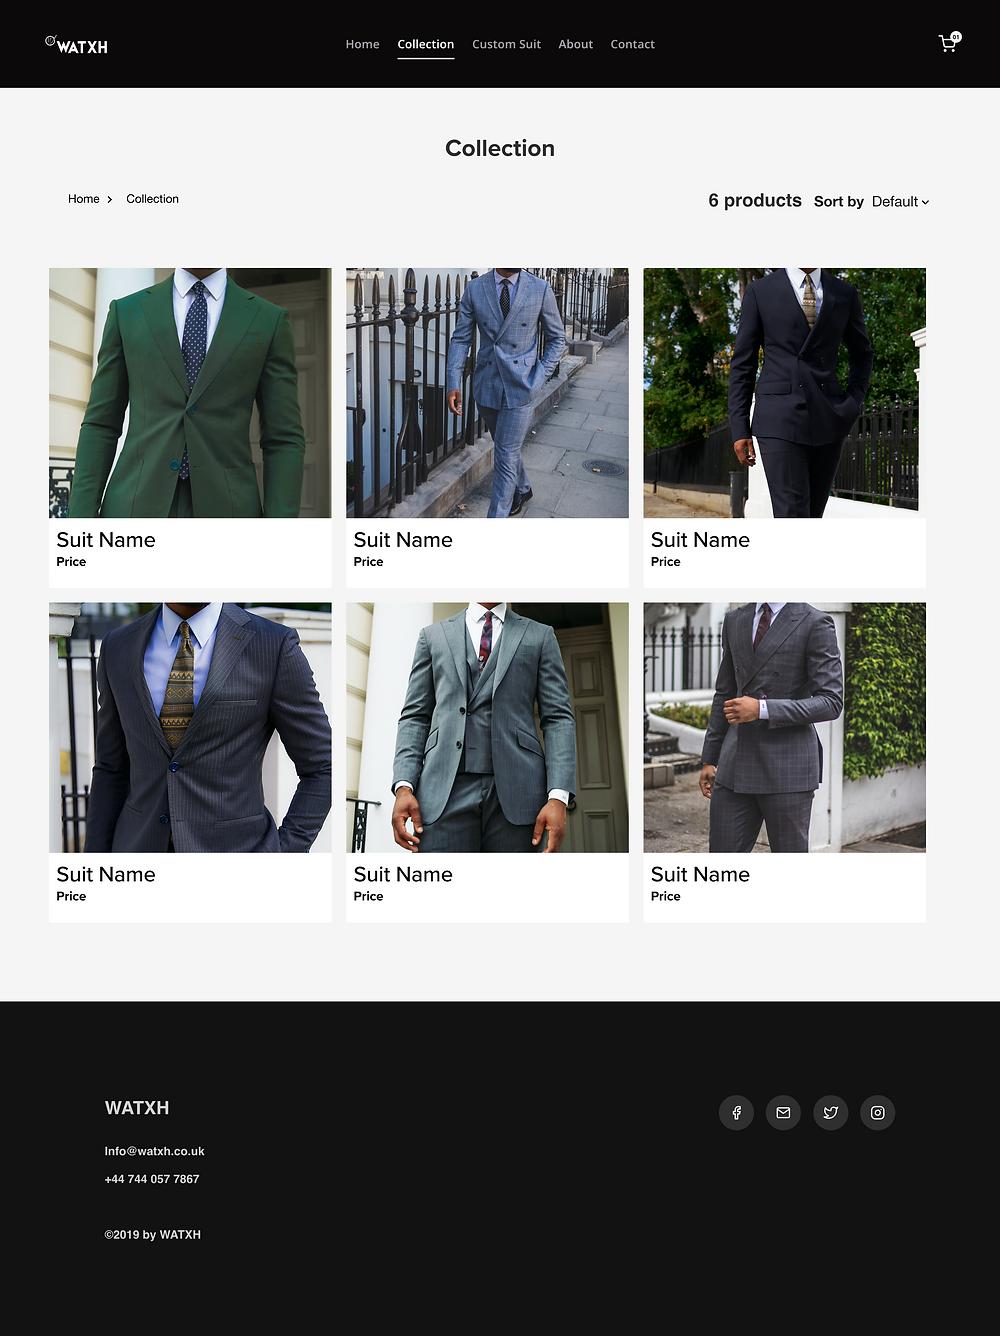 WATXH Collection Page